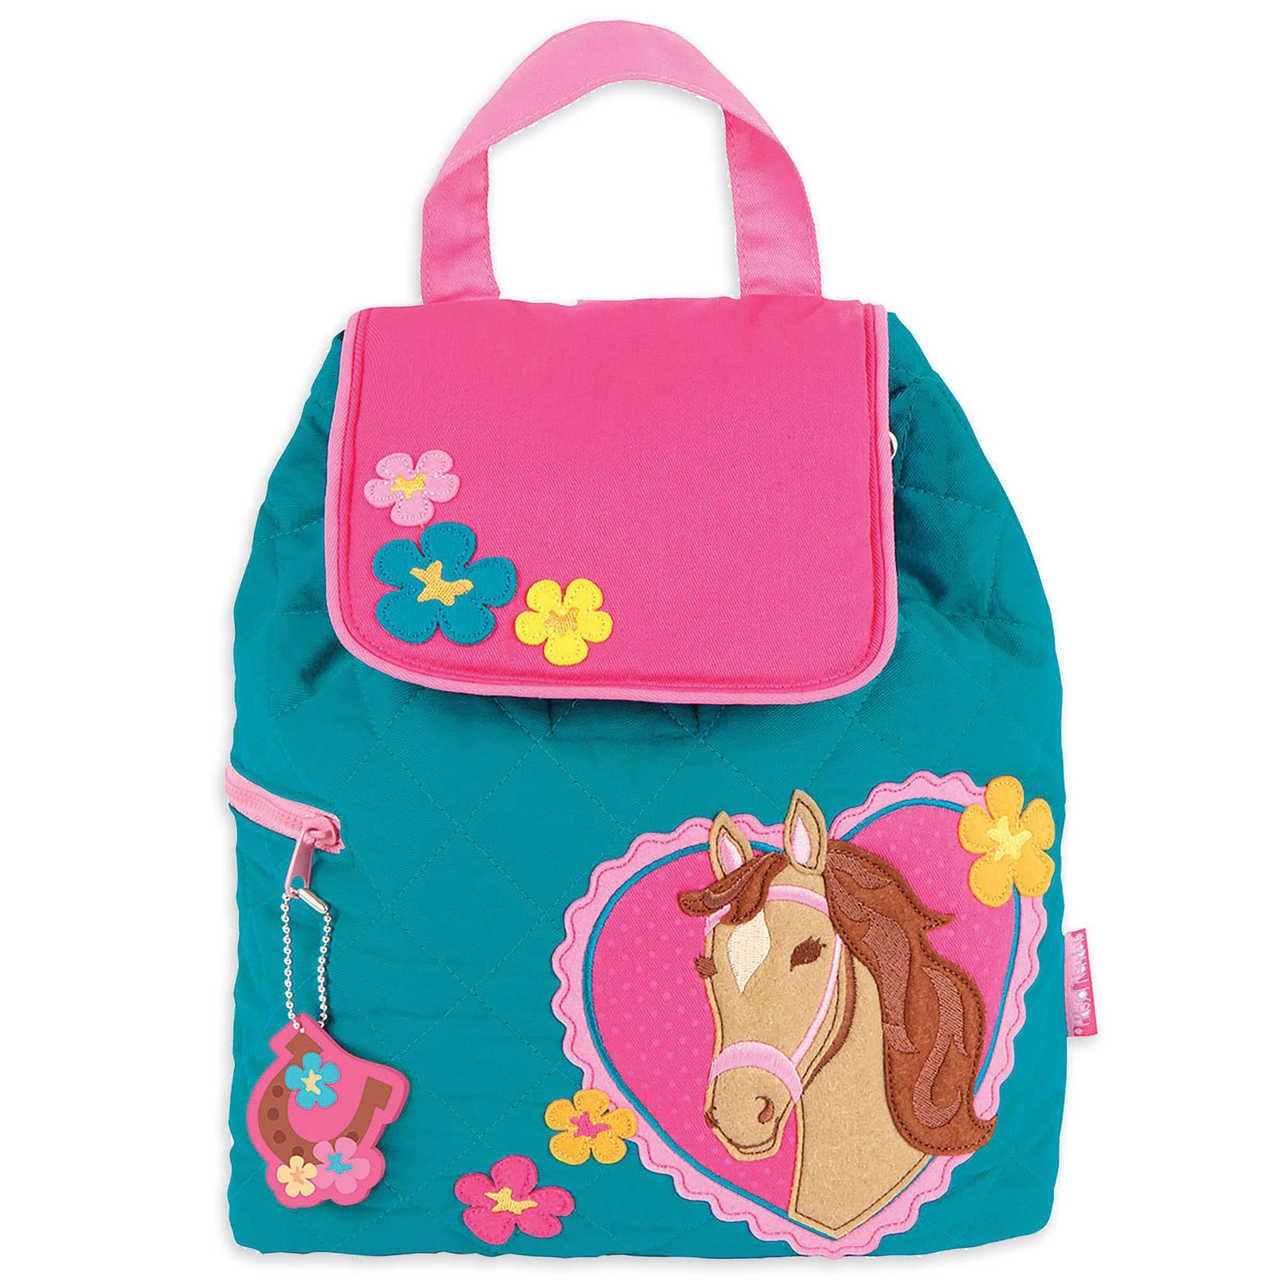 Toddler Backpacks - Stephen Joseph Quilted